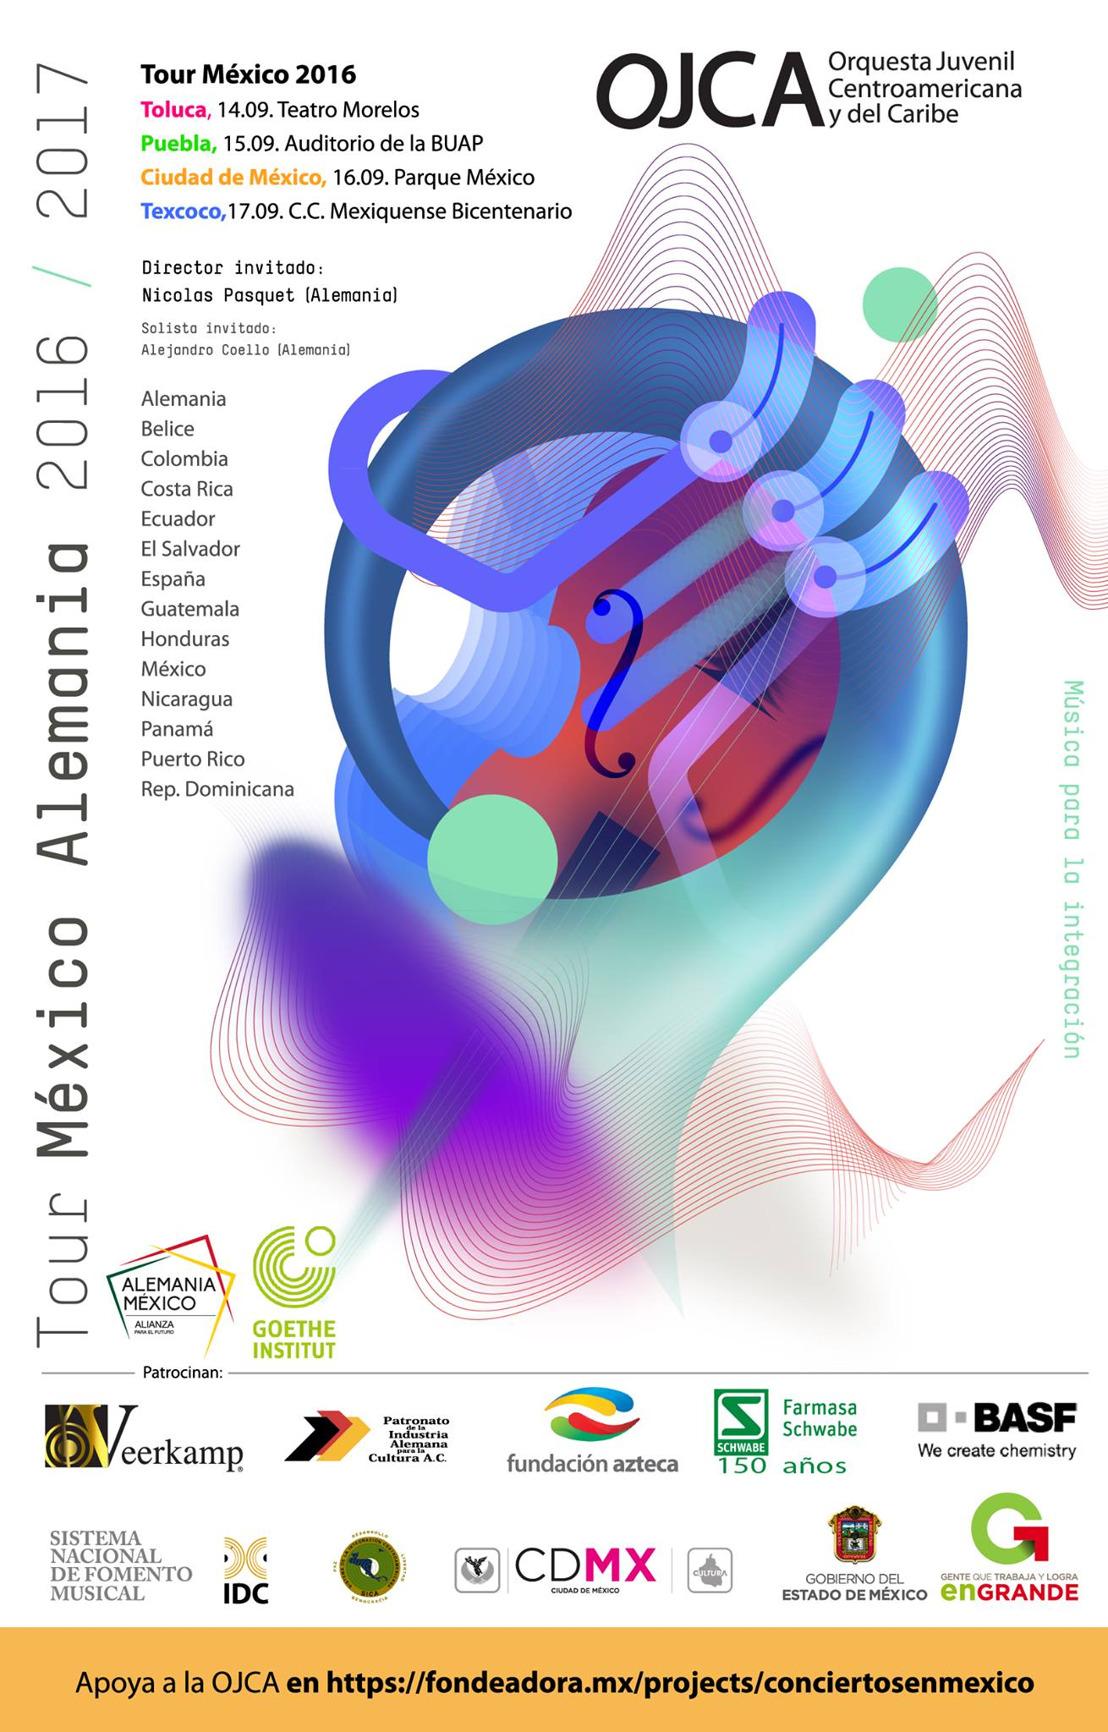 Orquesta Juvenil Centroamericana y del Caribe Tour México Alemania 2016-2017